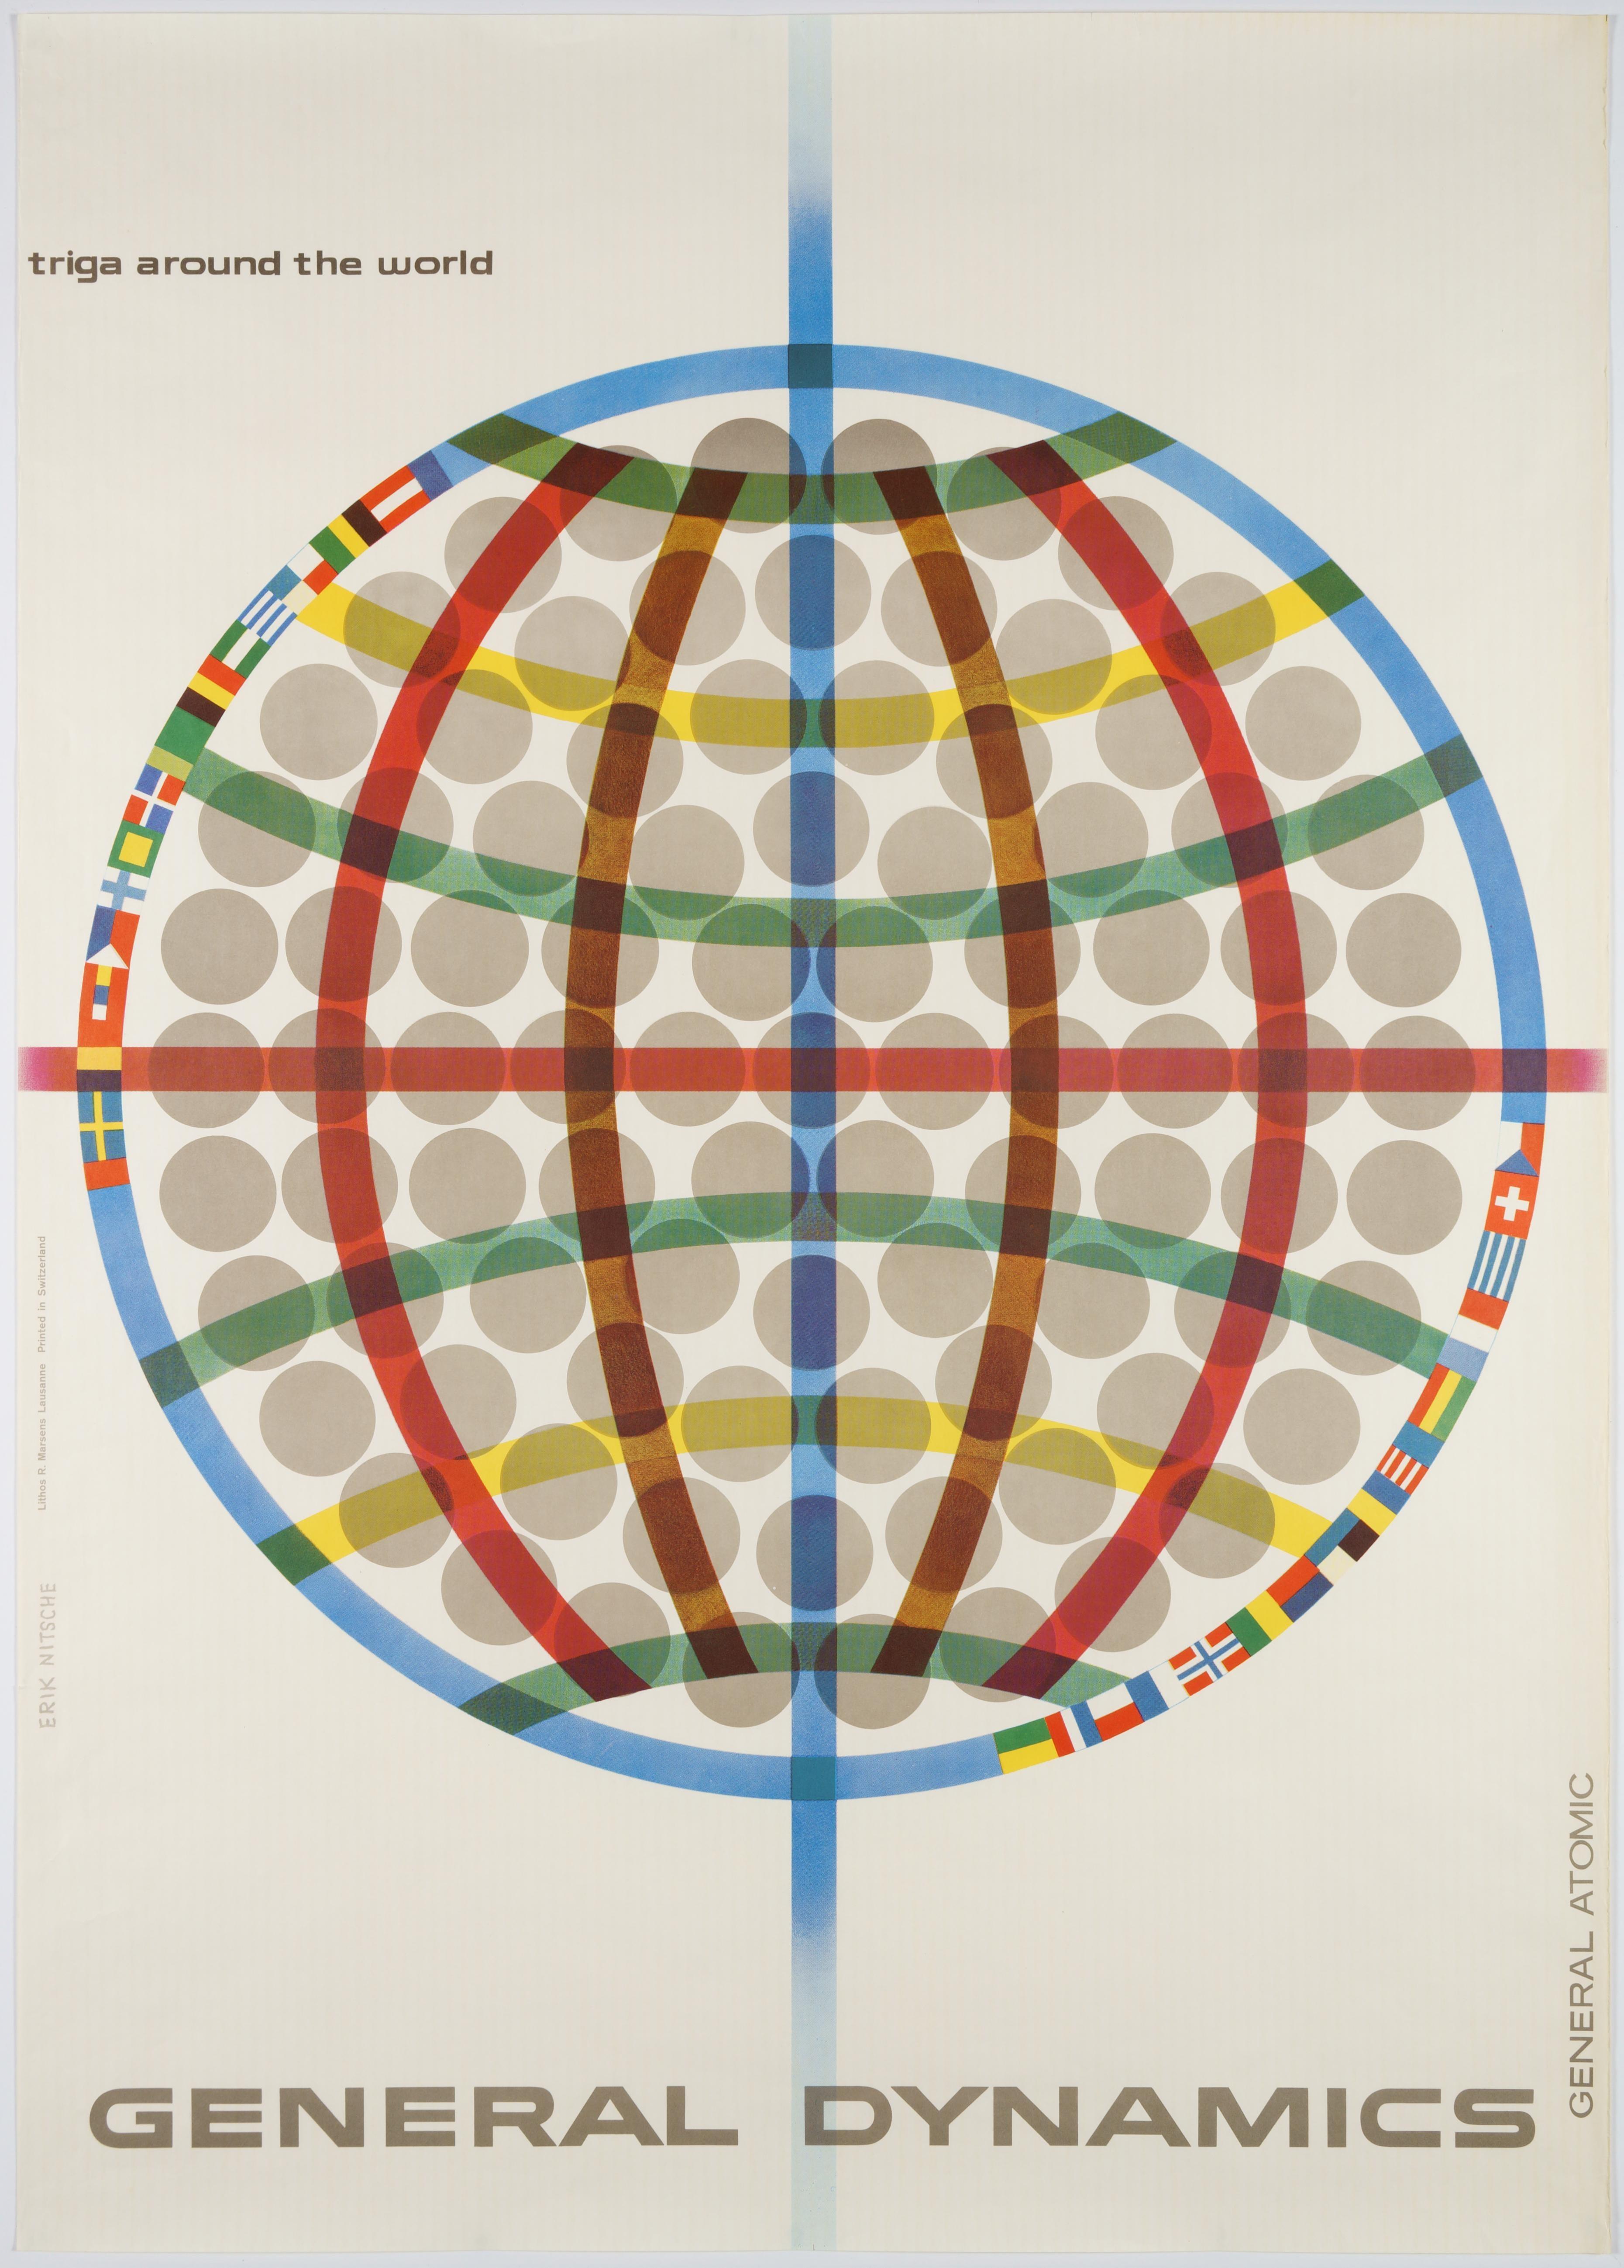 General Dynamics, Atom Reactor Triga around the World – Original Vintage Poster